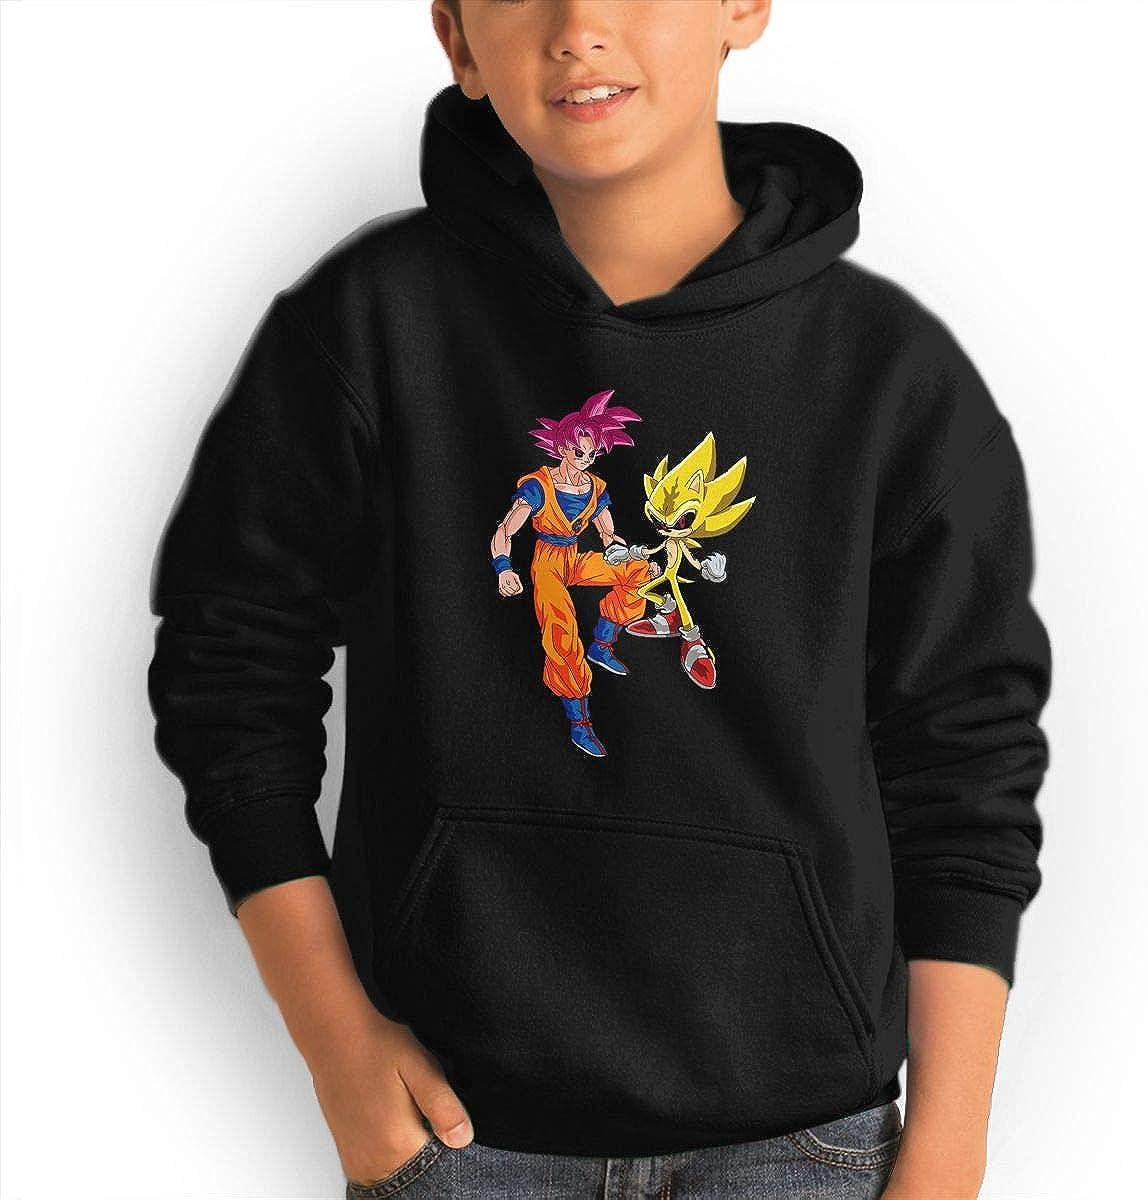 Red Coffee Teen Fashion Hoodie Hooded Sweatshirt Pocket Youth Boys Girls Sweaters,Super Saiyan God Goku and Super Sonic